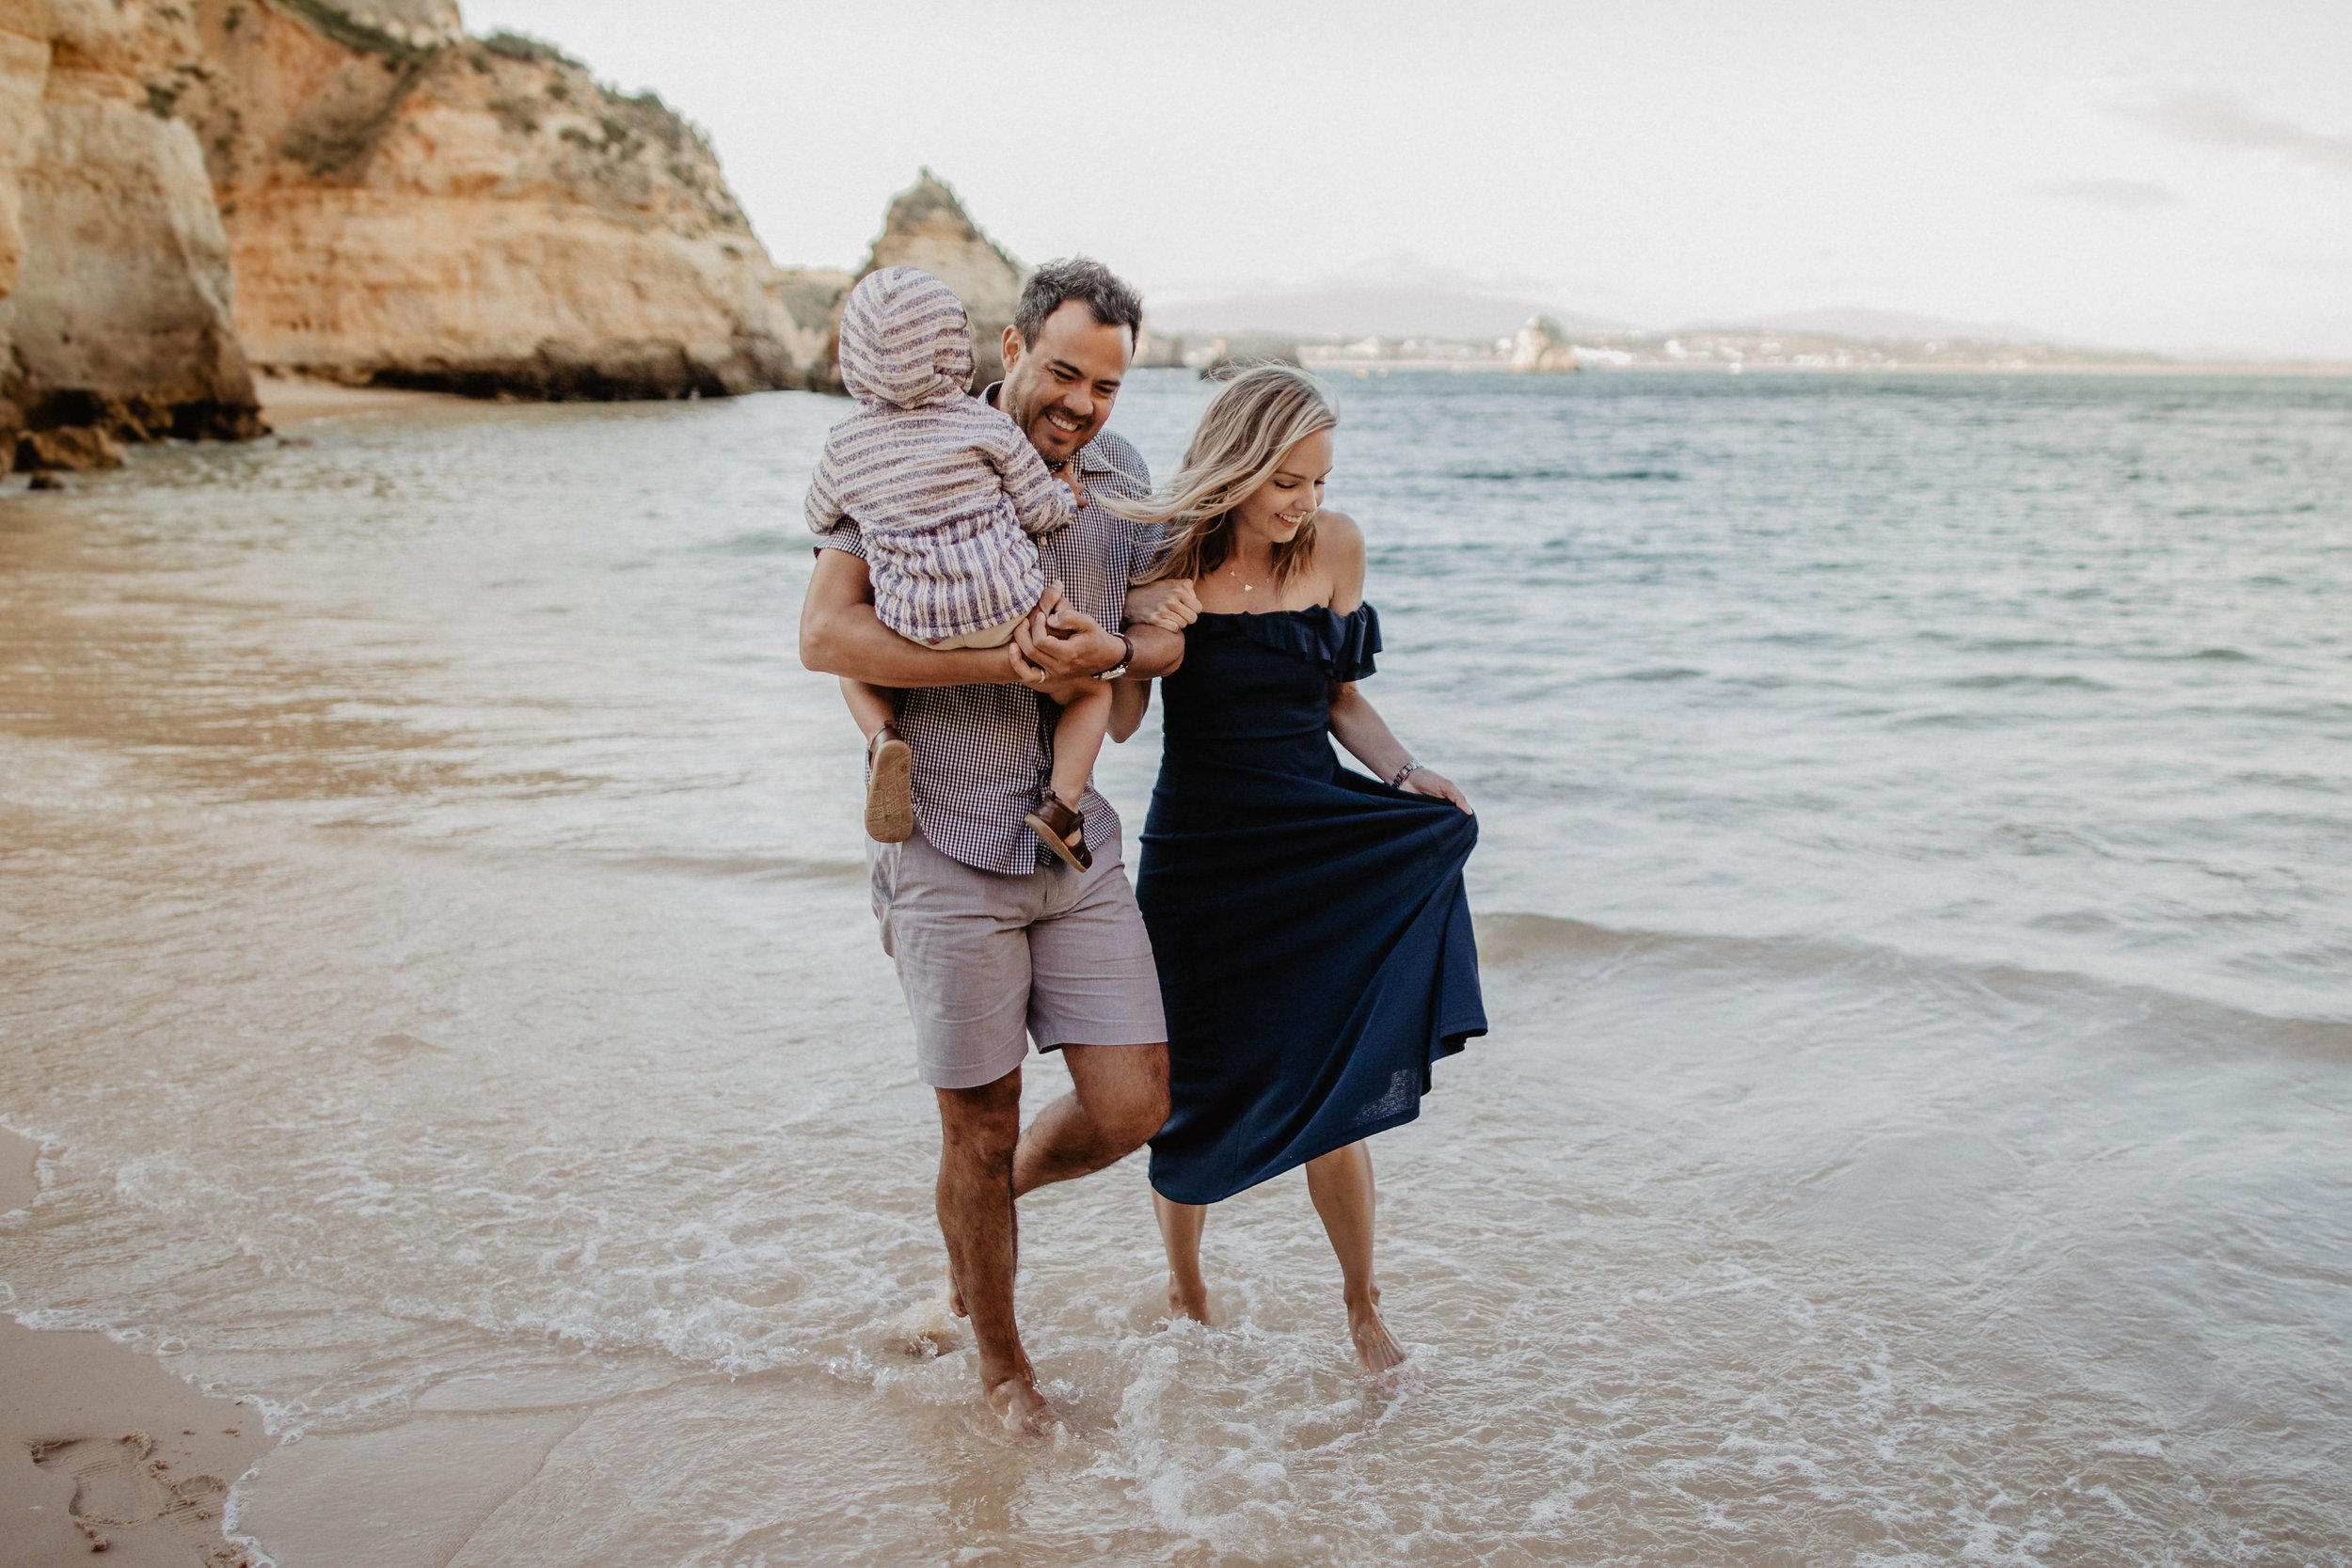 Lapela-Family-photography-Lagos-Algarve30.jpg